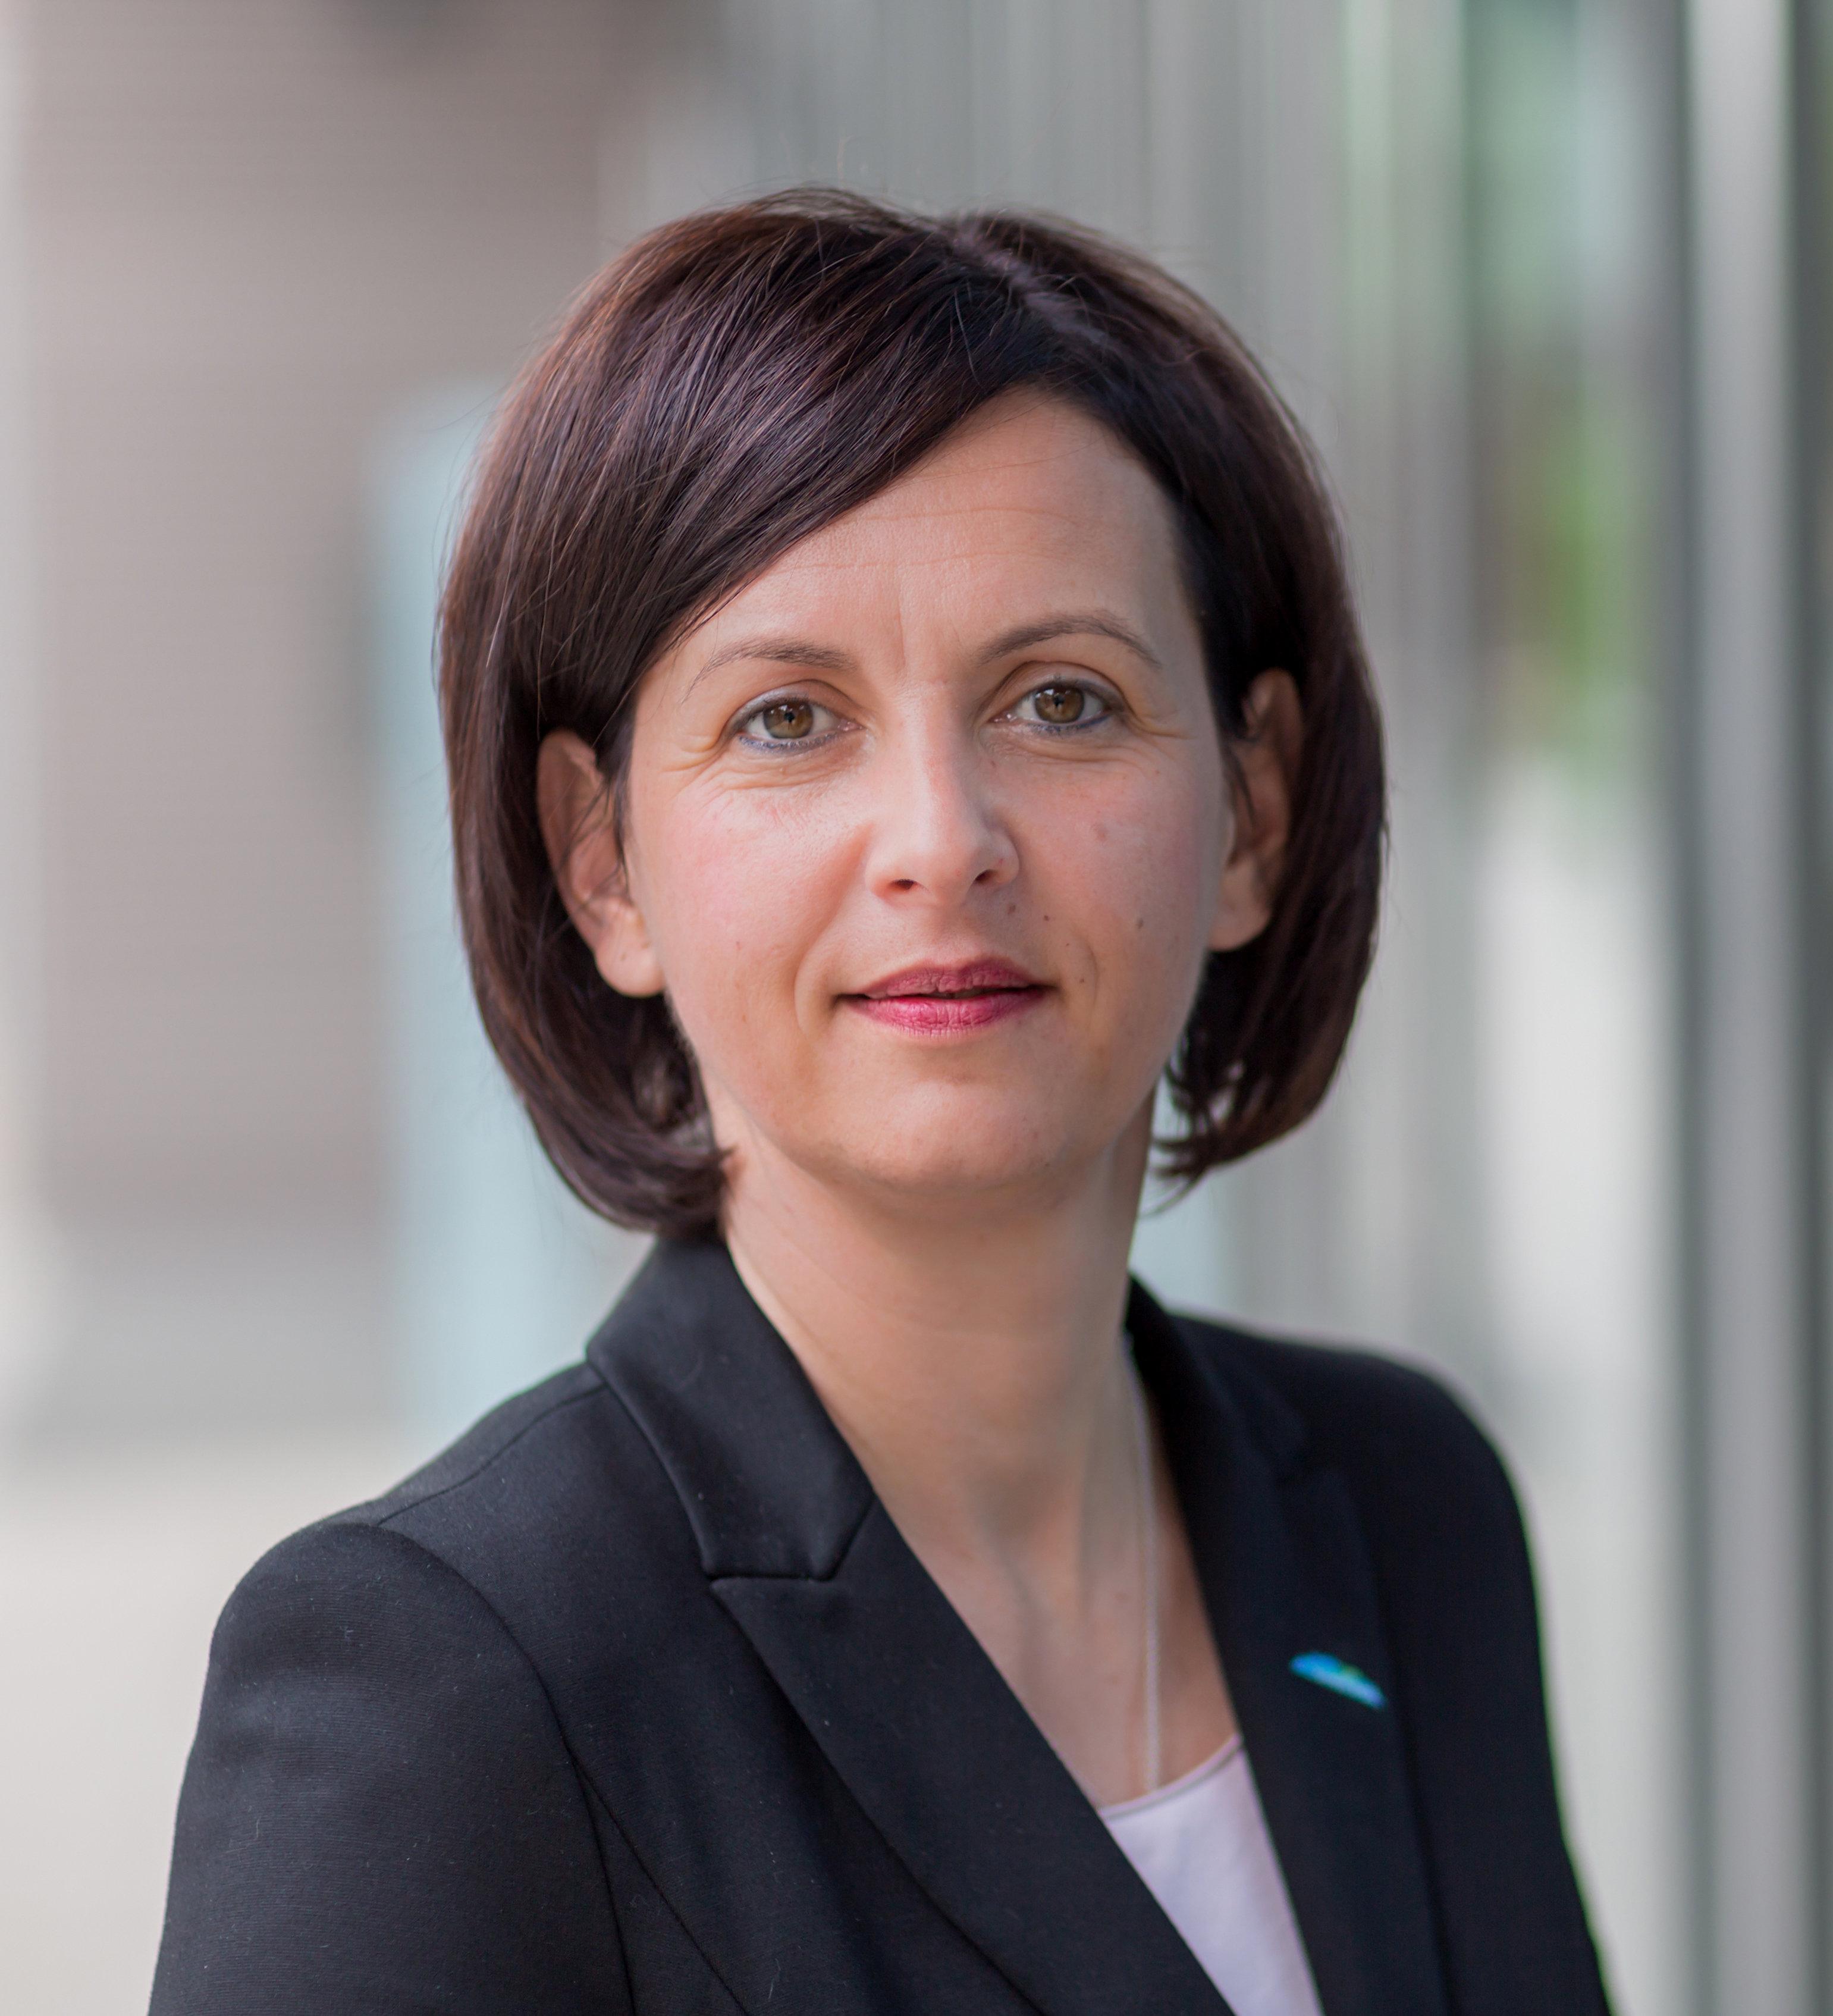 Cornelia Grimm, Regionalmanagerin forum Thüringer Wald e.V.